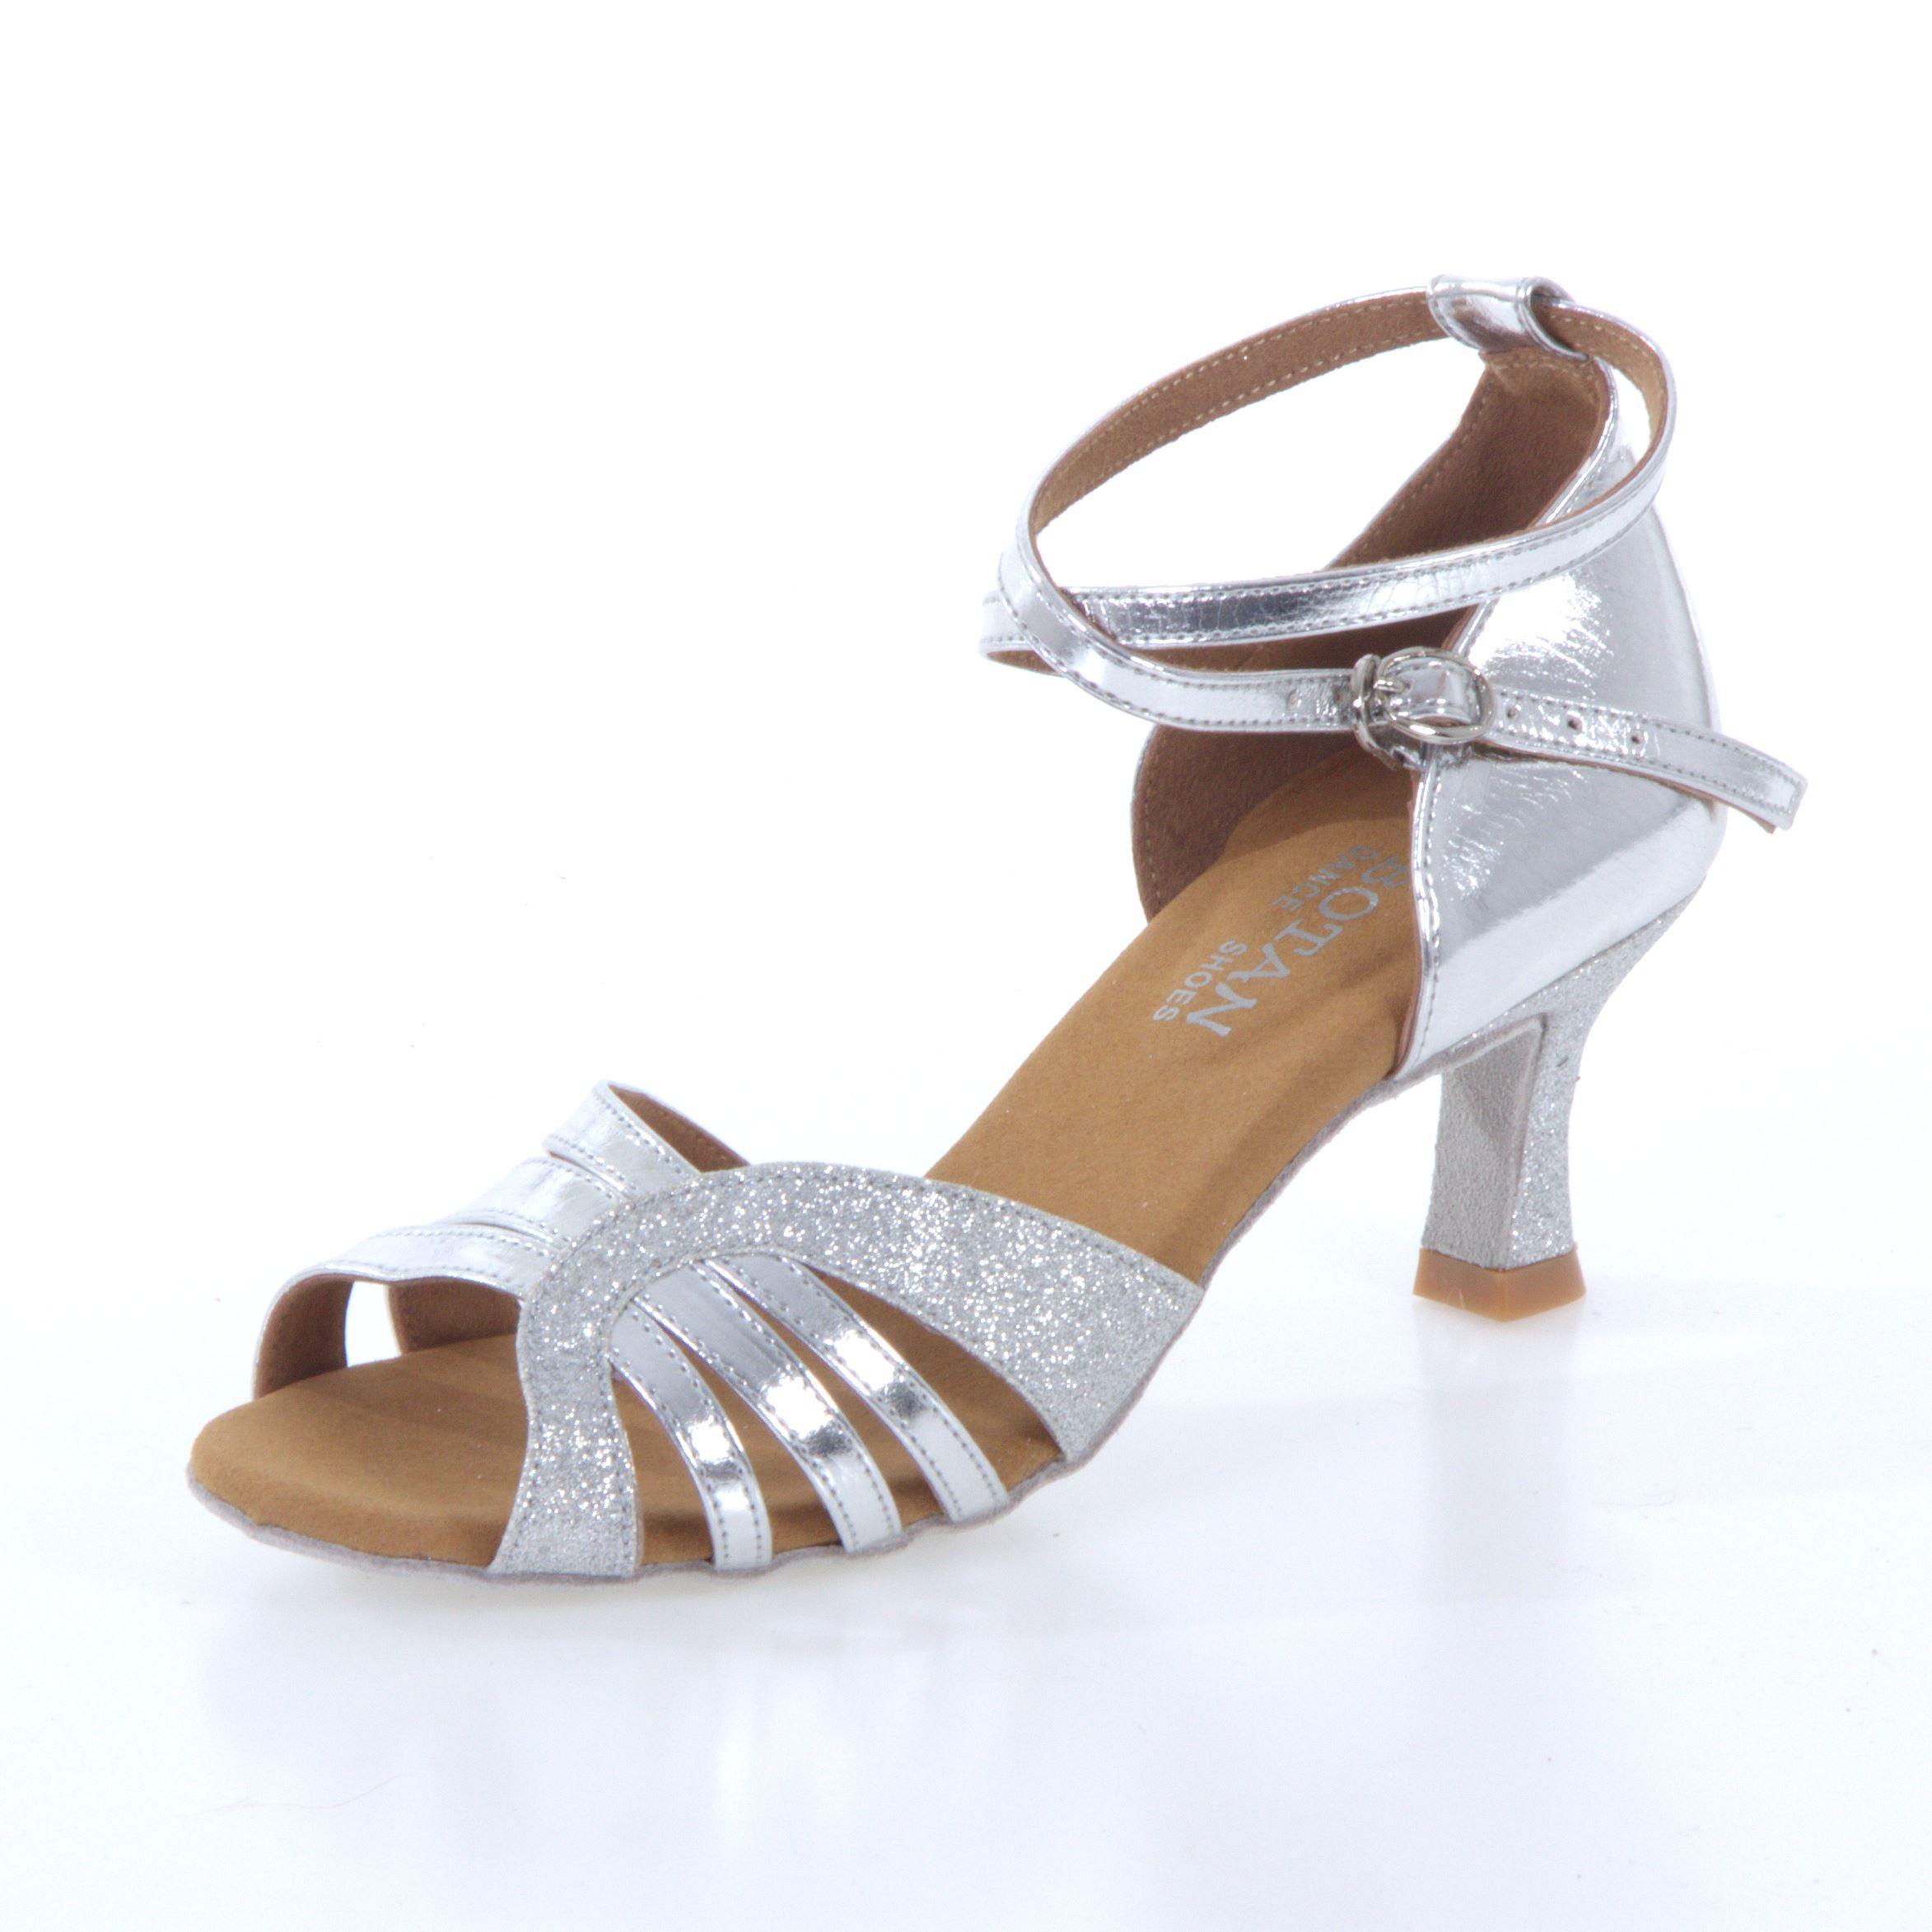 7be8f0e78b Dámske tanečné topánky Botan BL-14S strieborné